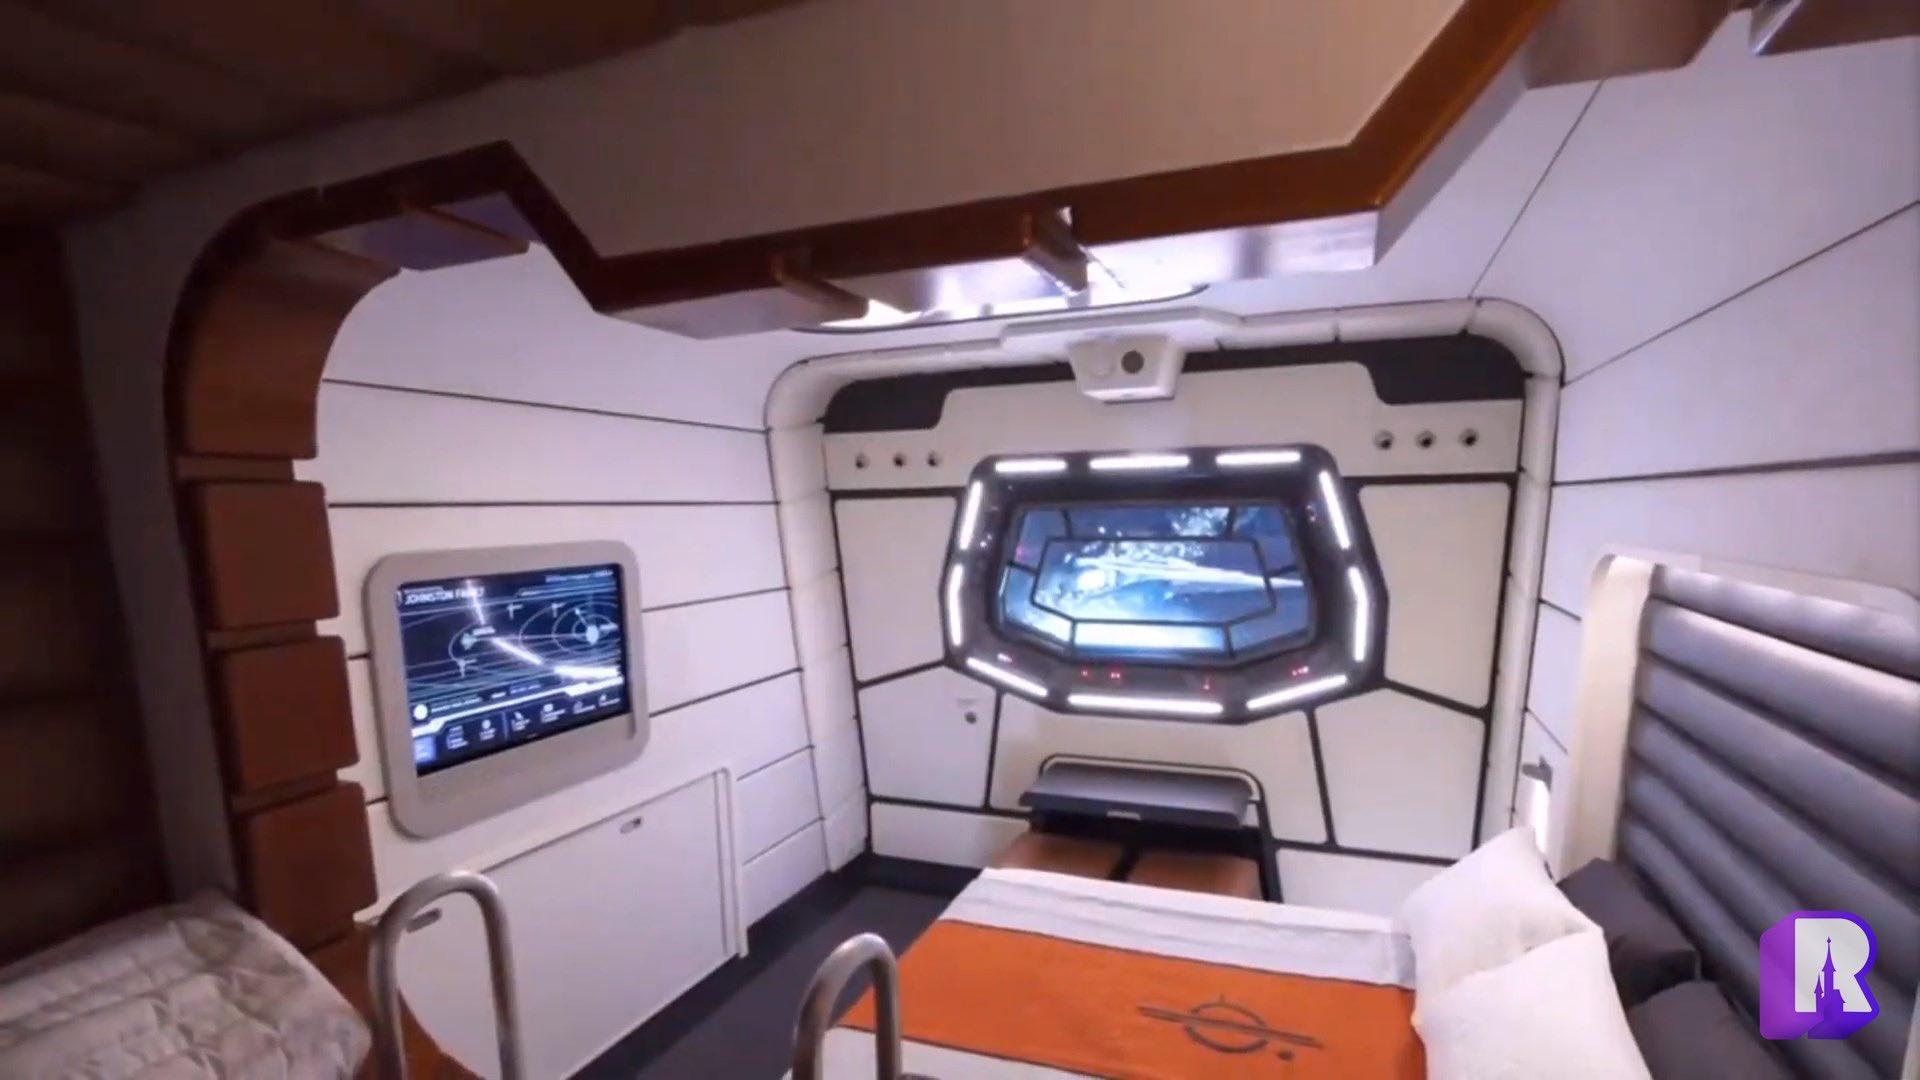 Star Wars Galactic Starcruiser Cabins